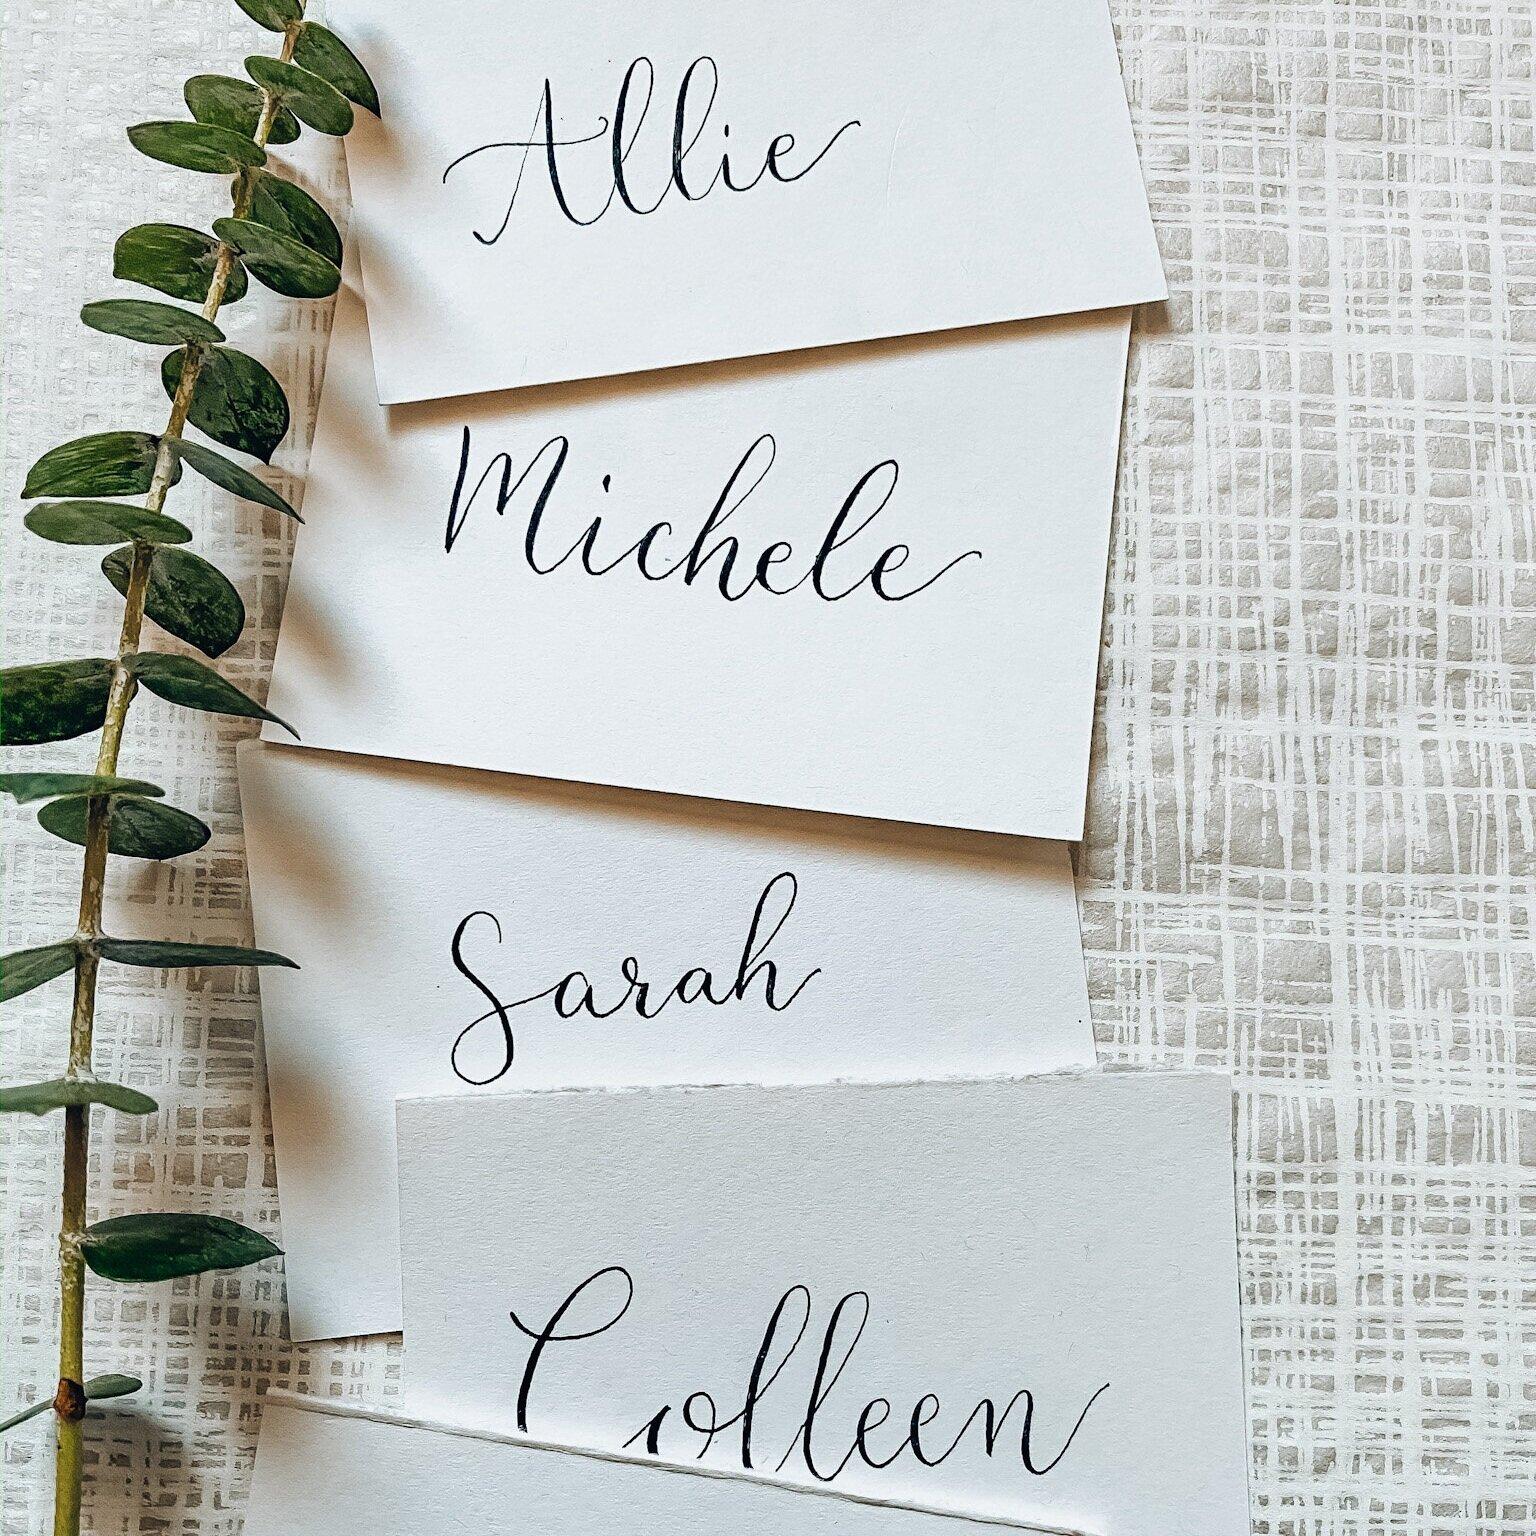 Rose laser cut place cards  Handwritten  Calligraphy  Modern calligraphy  Wedding  PartyBrunch Unique Elegant wedding Custom made